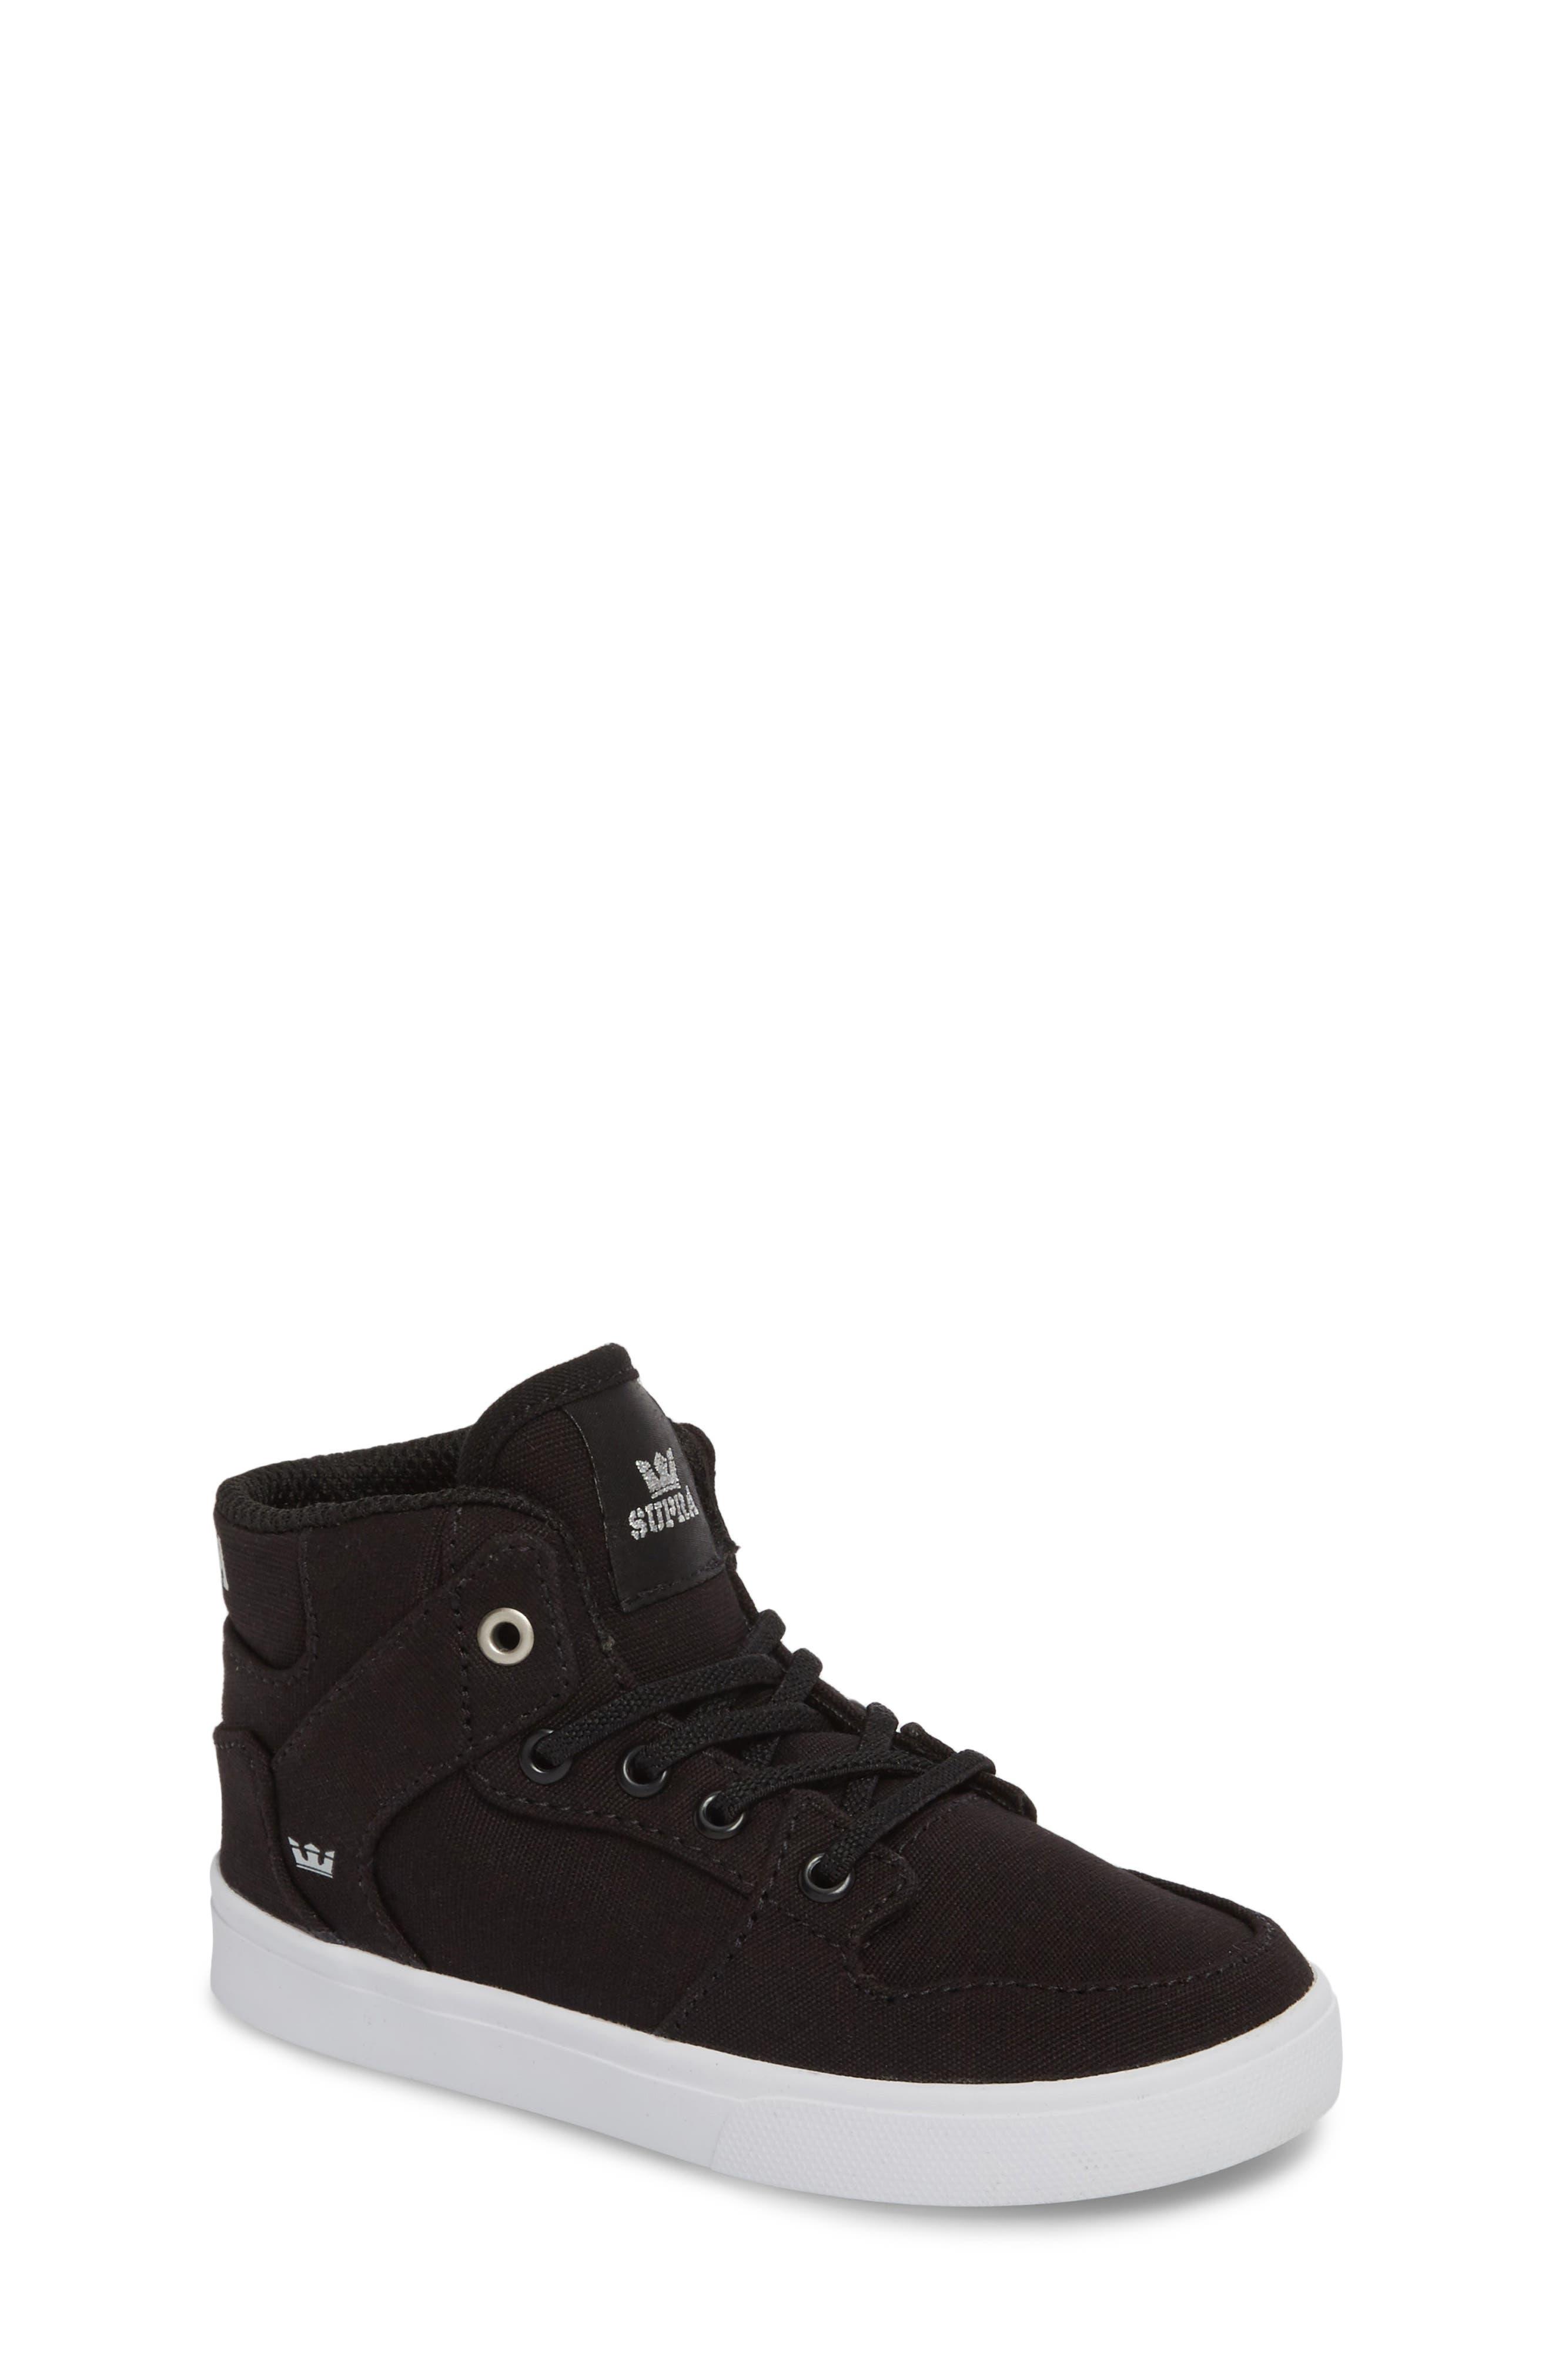 'Vaider' High Top Sneaker,                             Main thumbnail 1, color,                             Black/ White